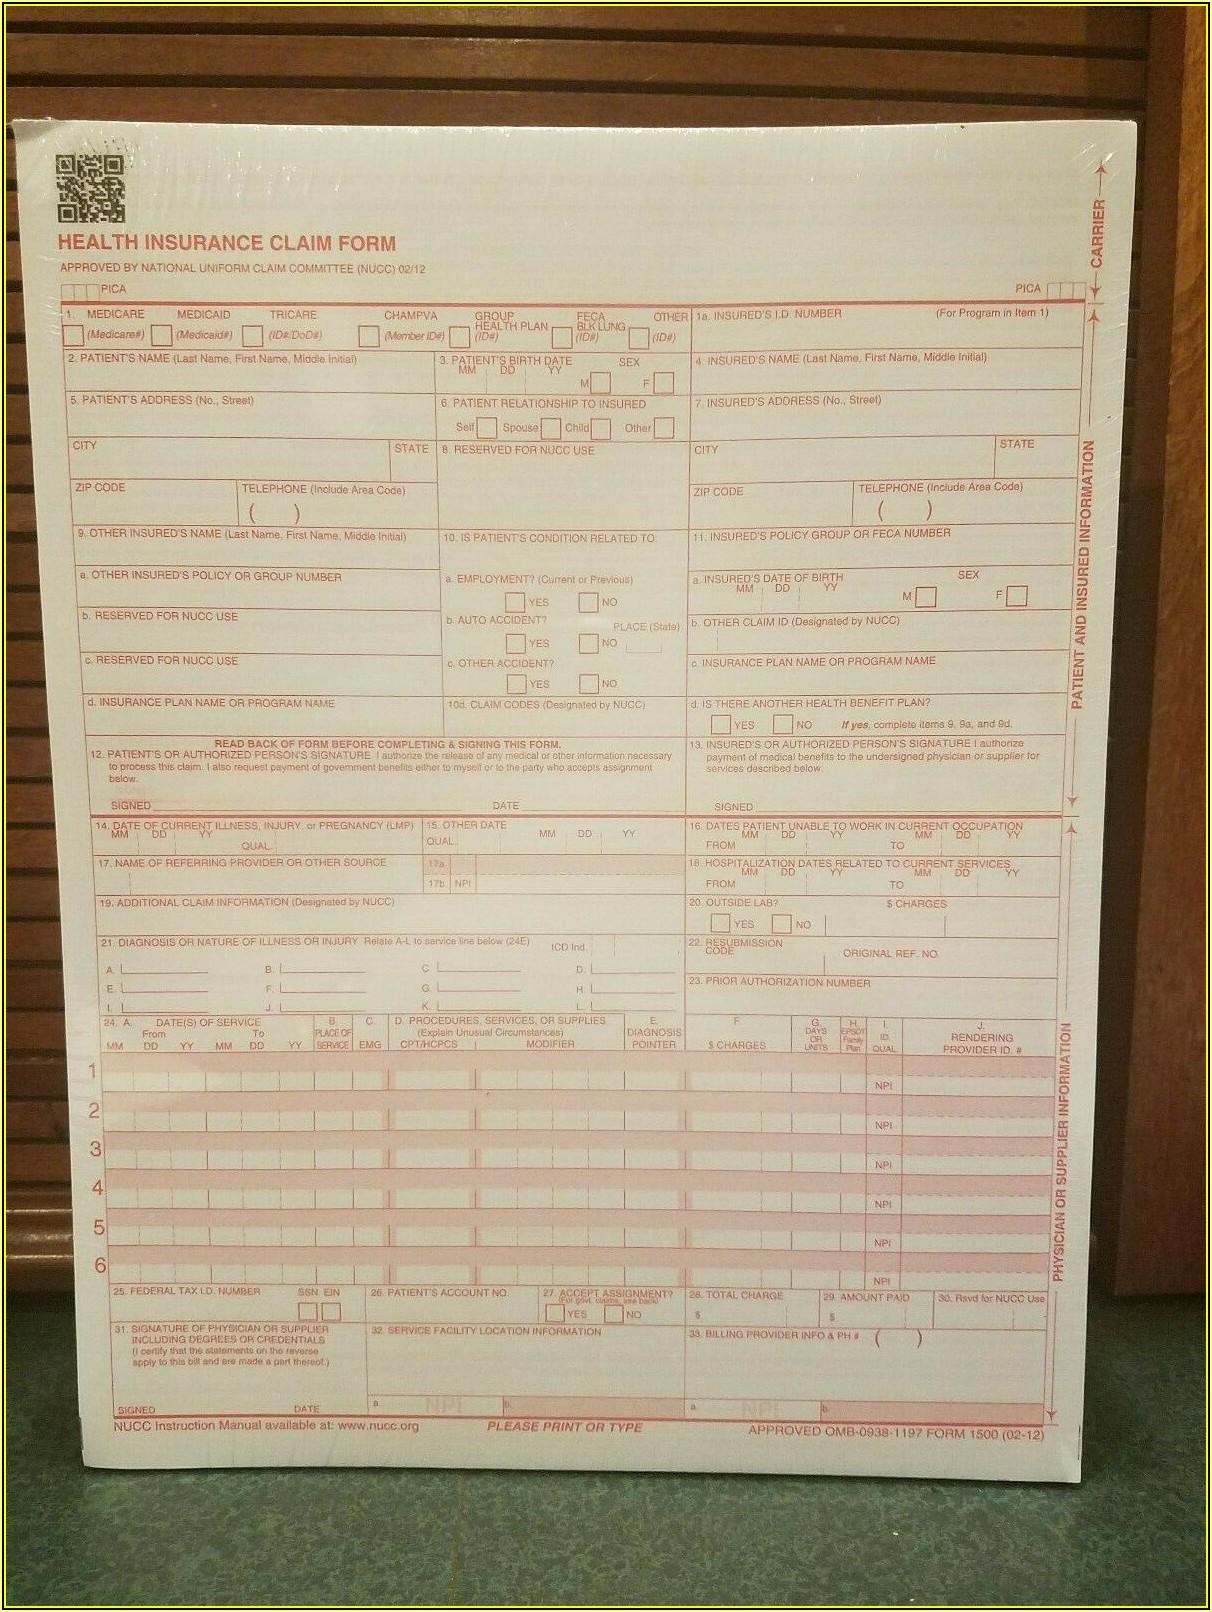 New Cms 1500 Claim Forms Hcfa (version 0212)